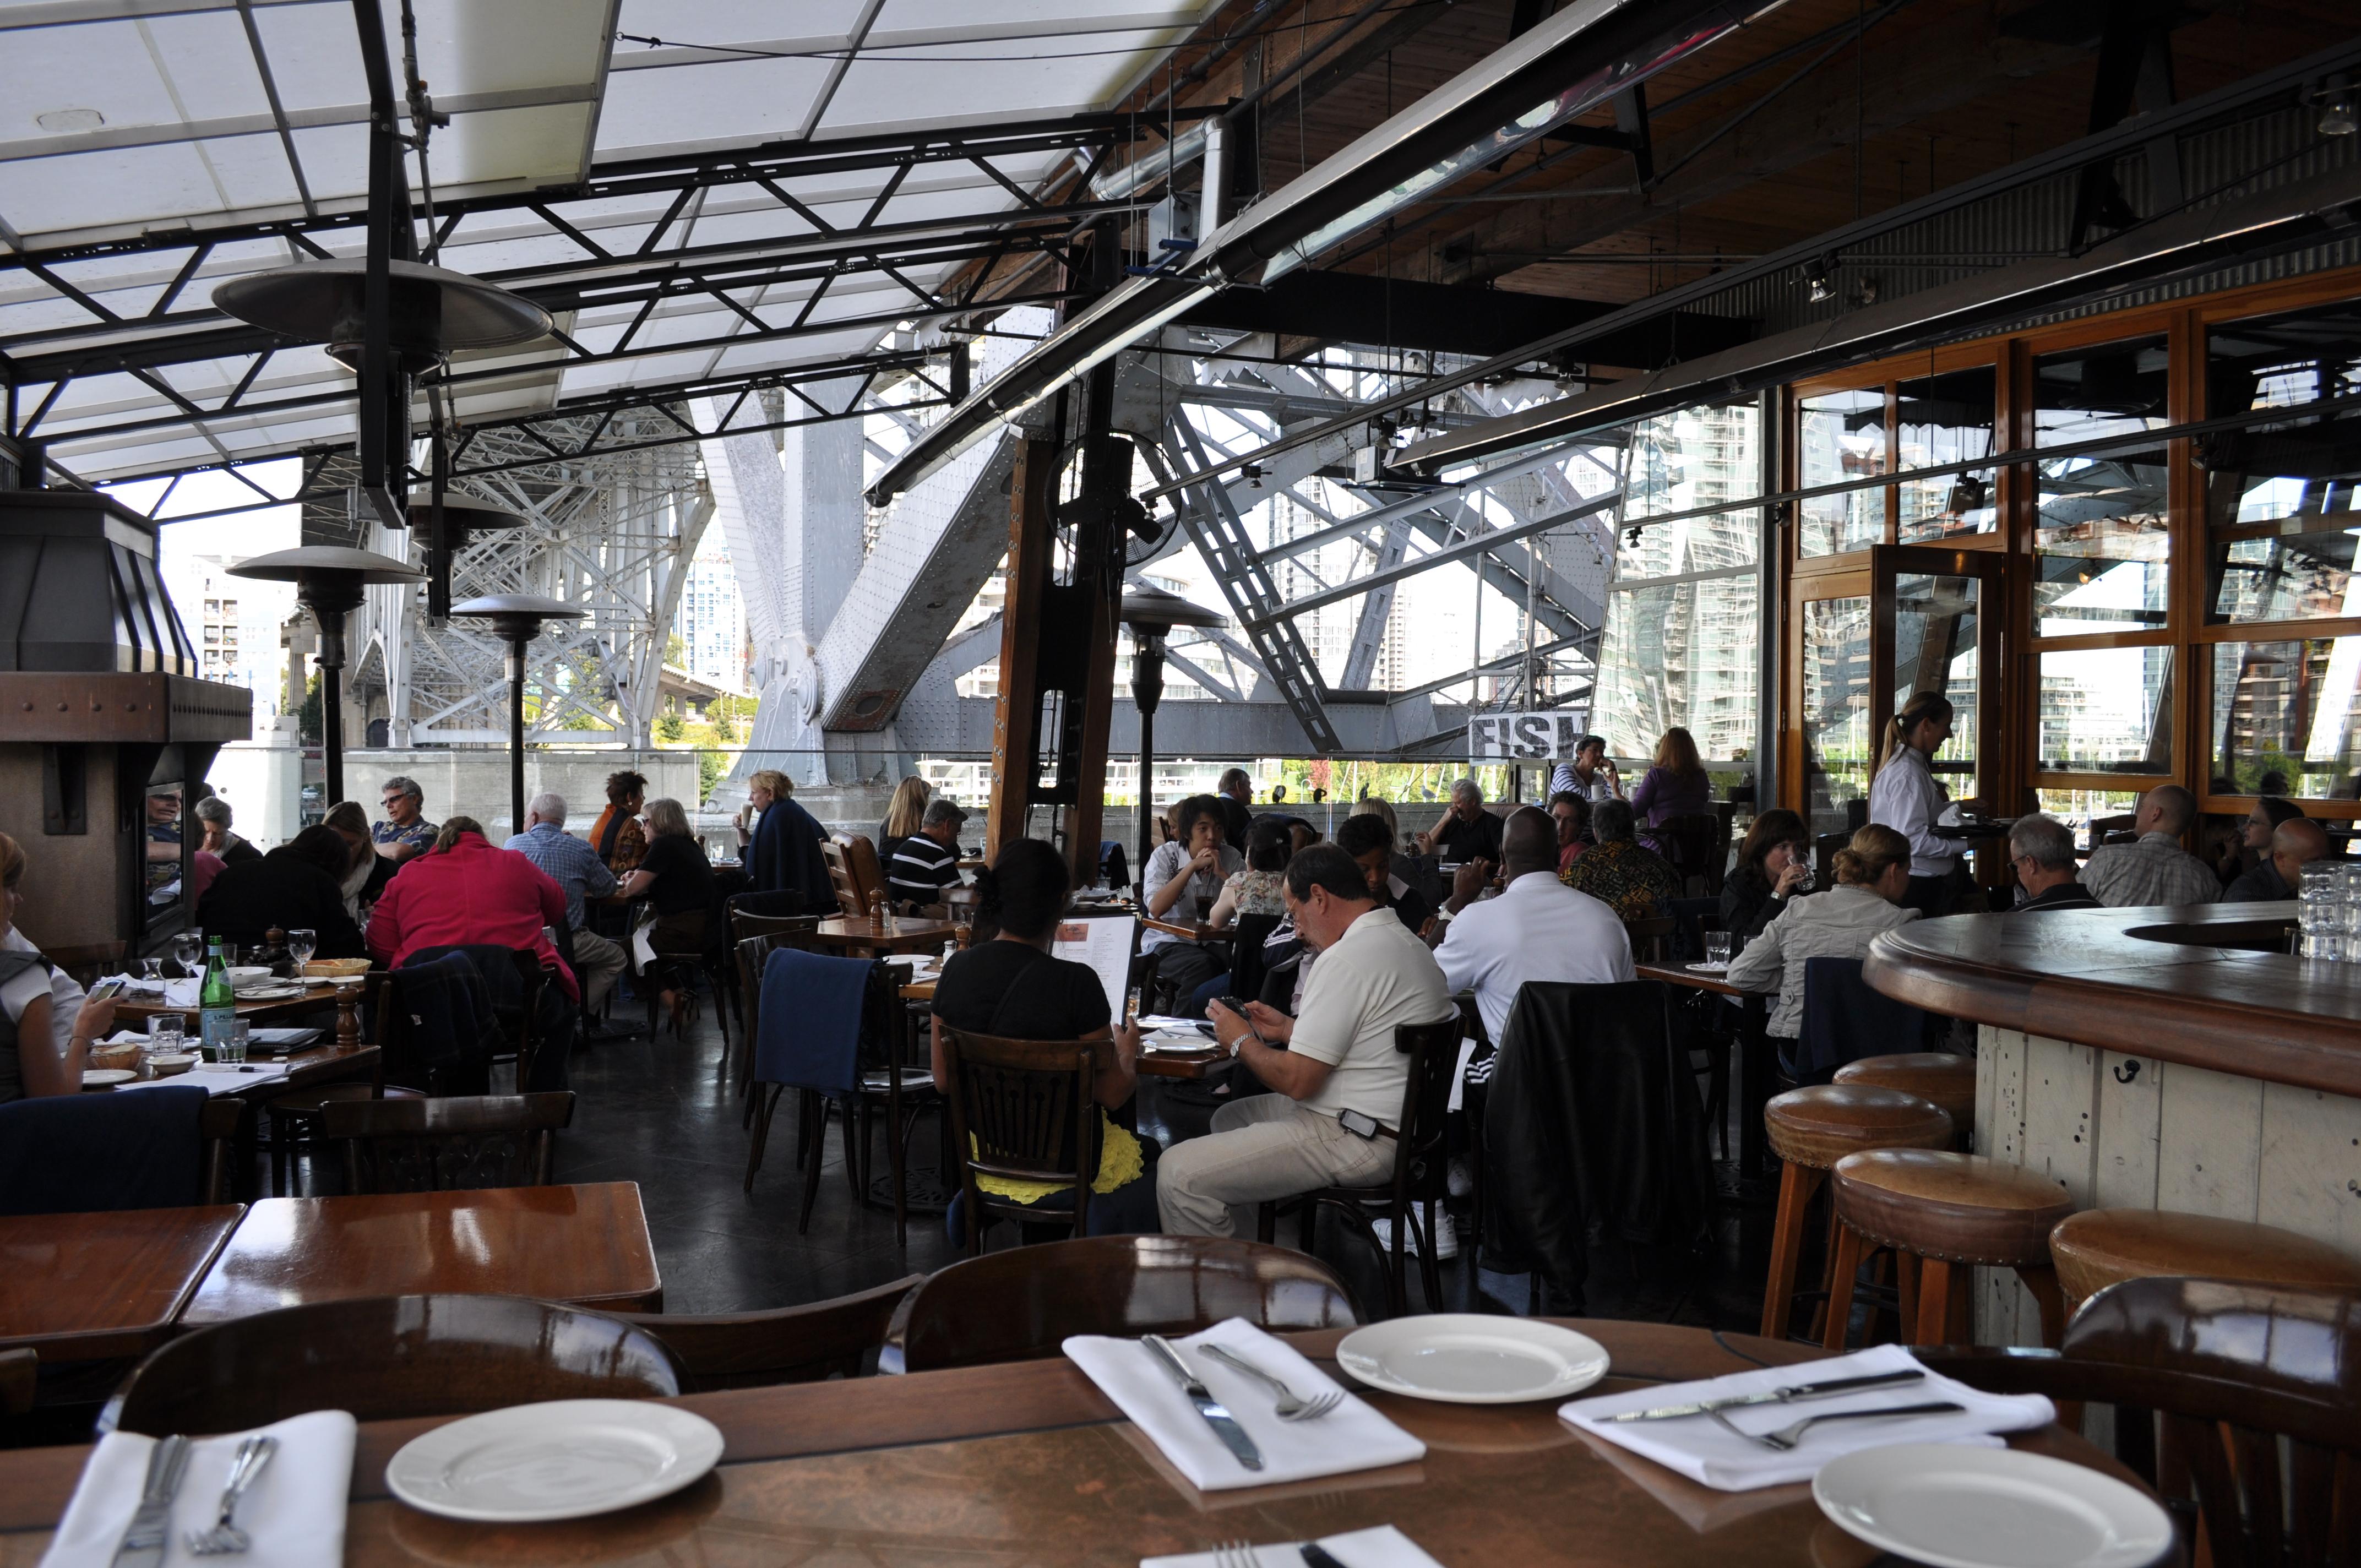 File Sandbar restaurant patio 01 Wikimedia mons